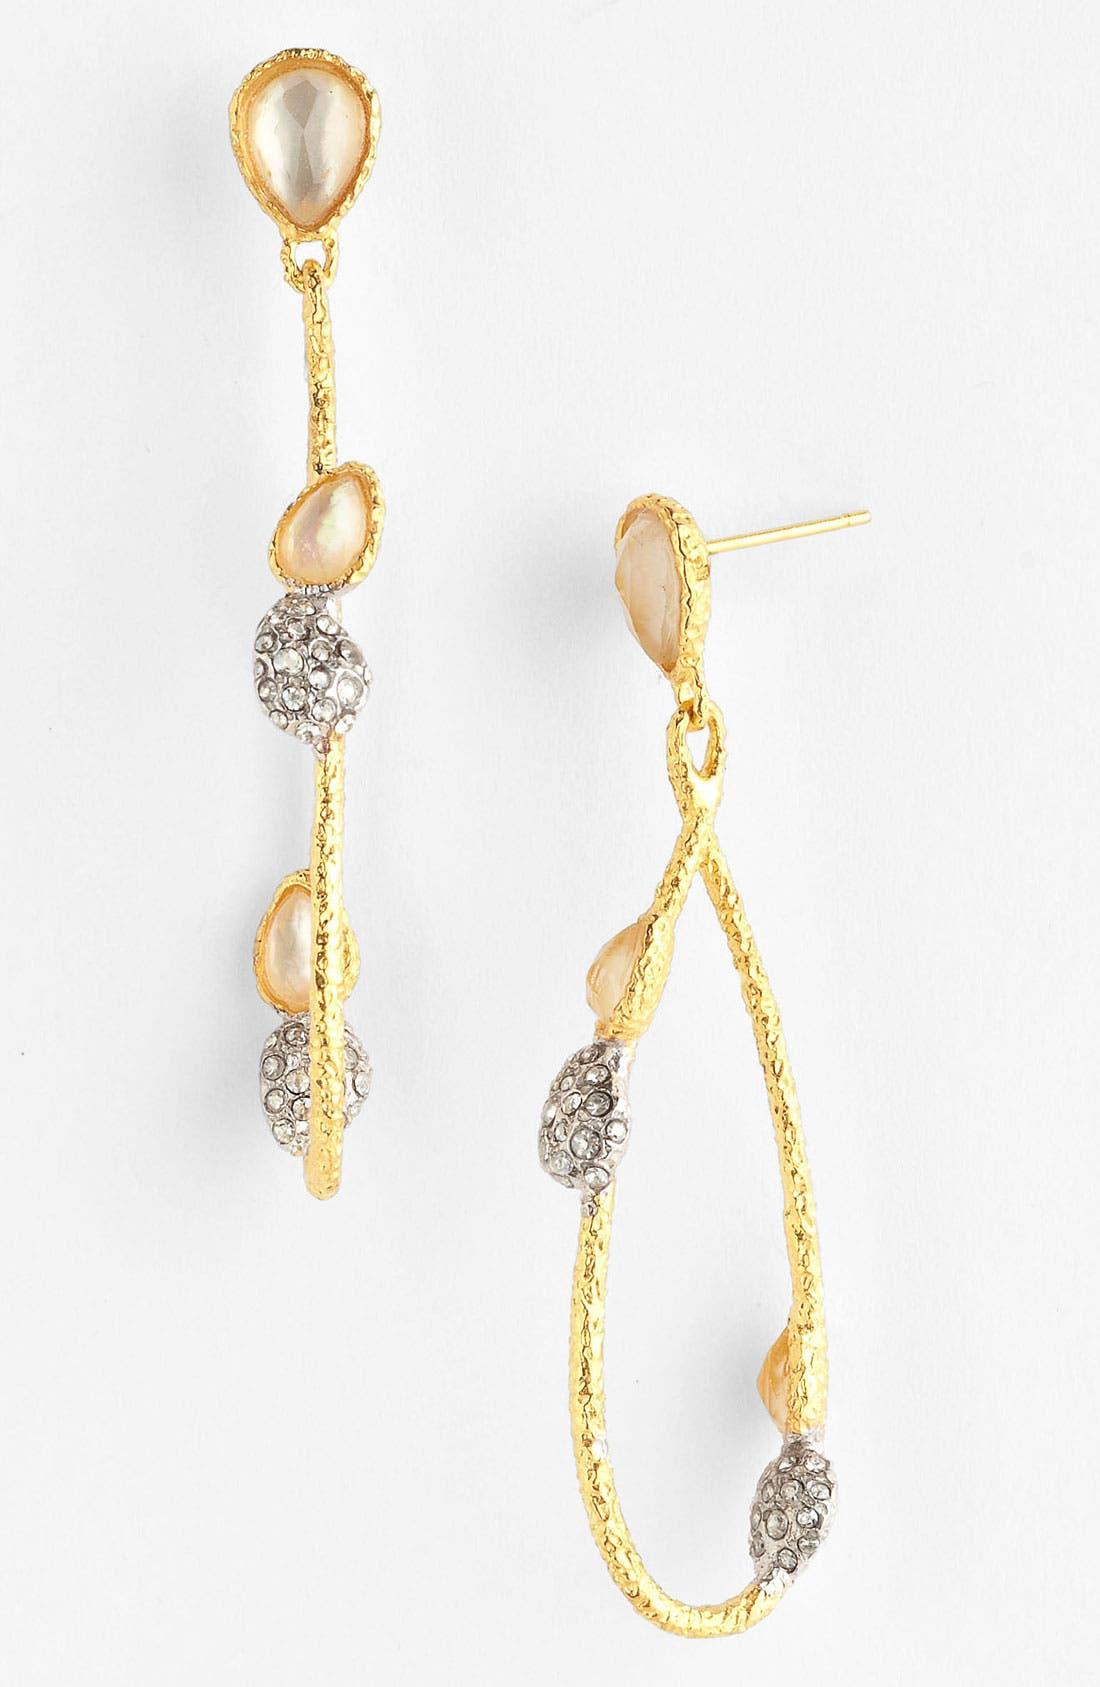 Main Image - Alexis Bittar 'Elements - Floral' Vine Teardrop Earrings